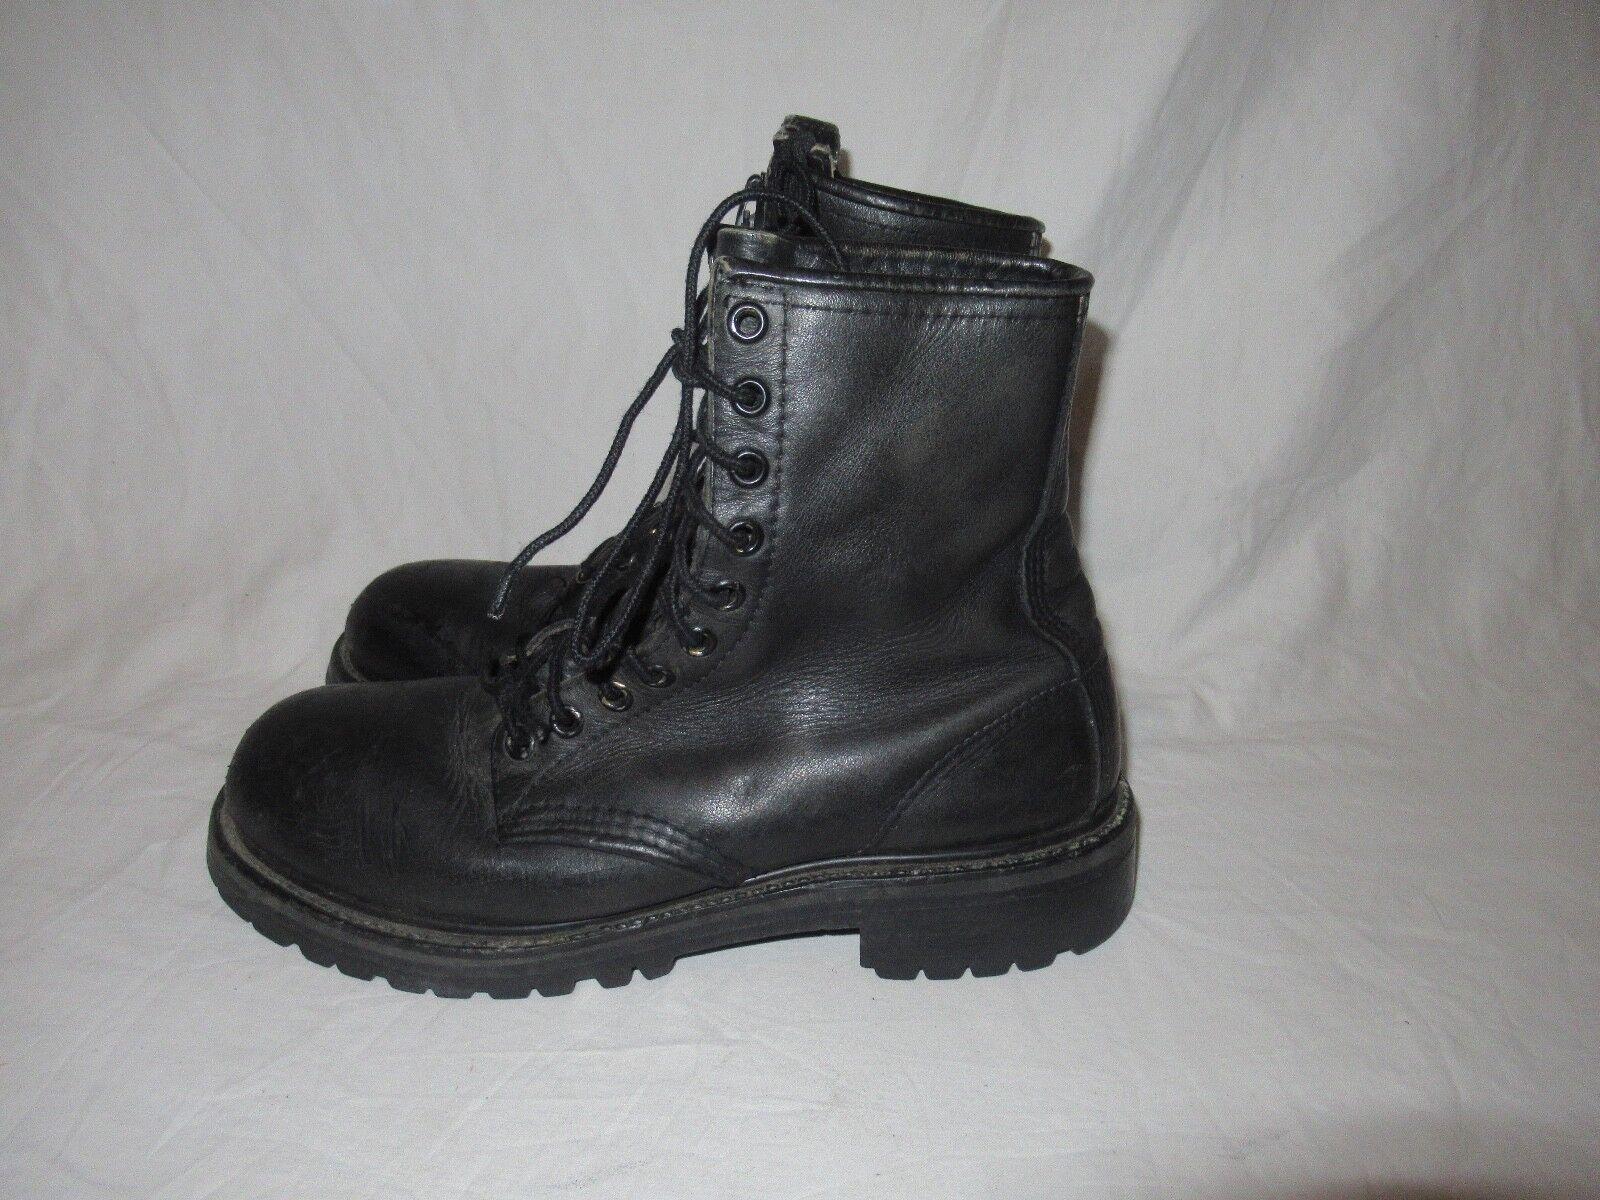 Ala roja Vintage botas Negro Cuero Cremallera Puntera De Acero Militar Estilo Motero D